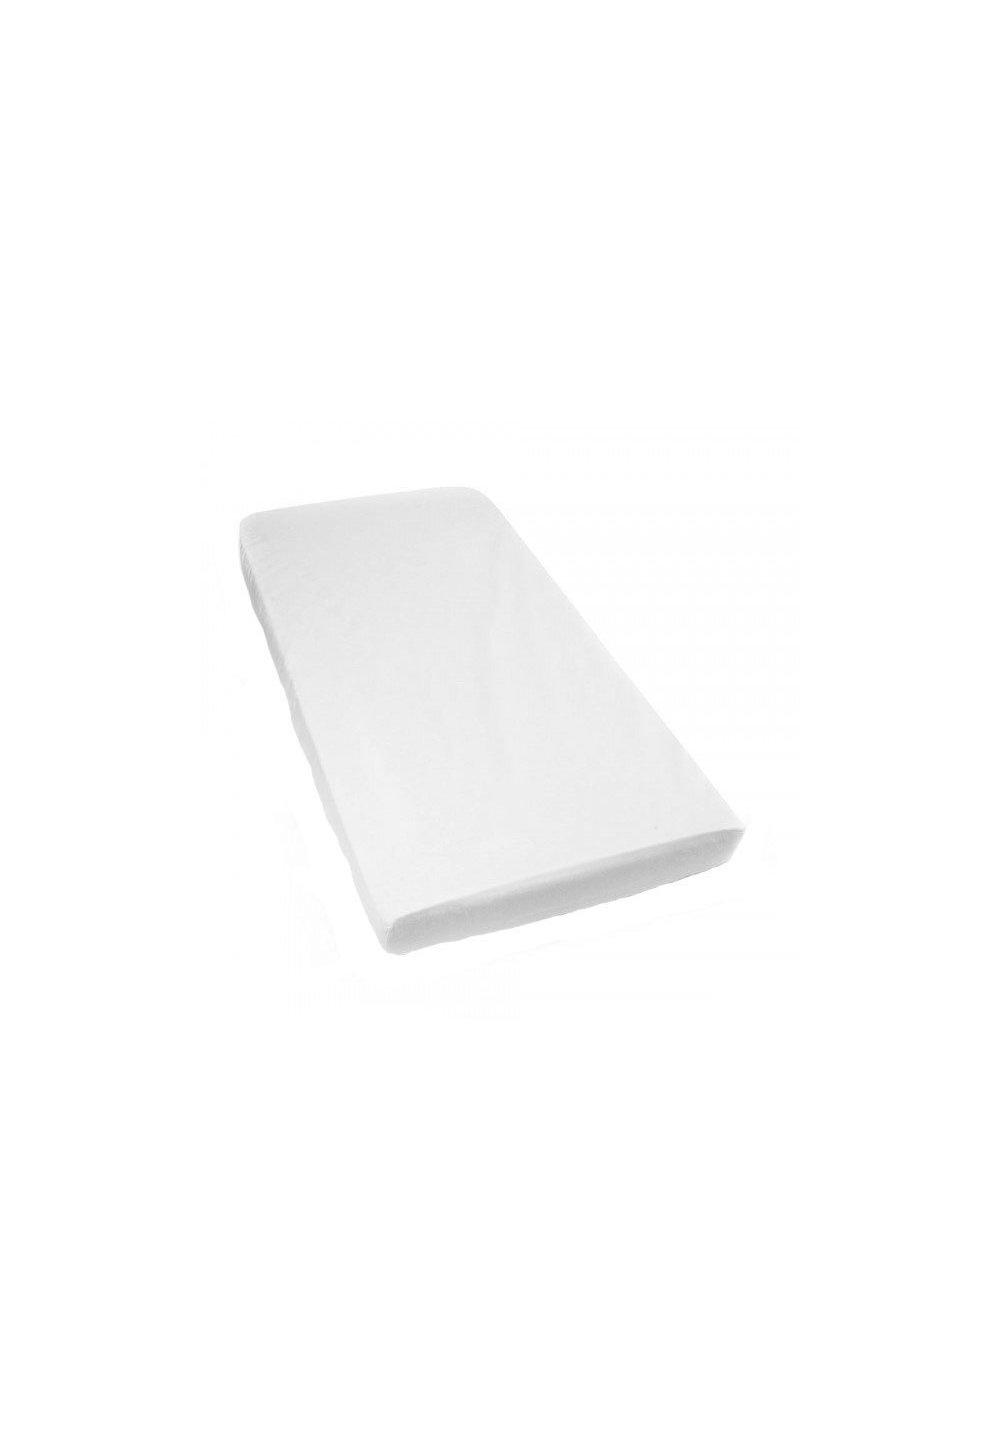 Cearceaf impermeabil cu elastic, piccolo, 90x40cm imagine